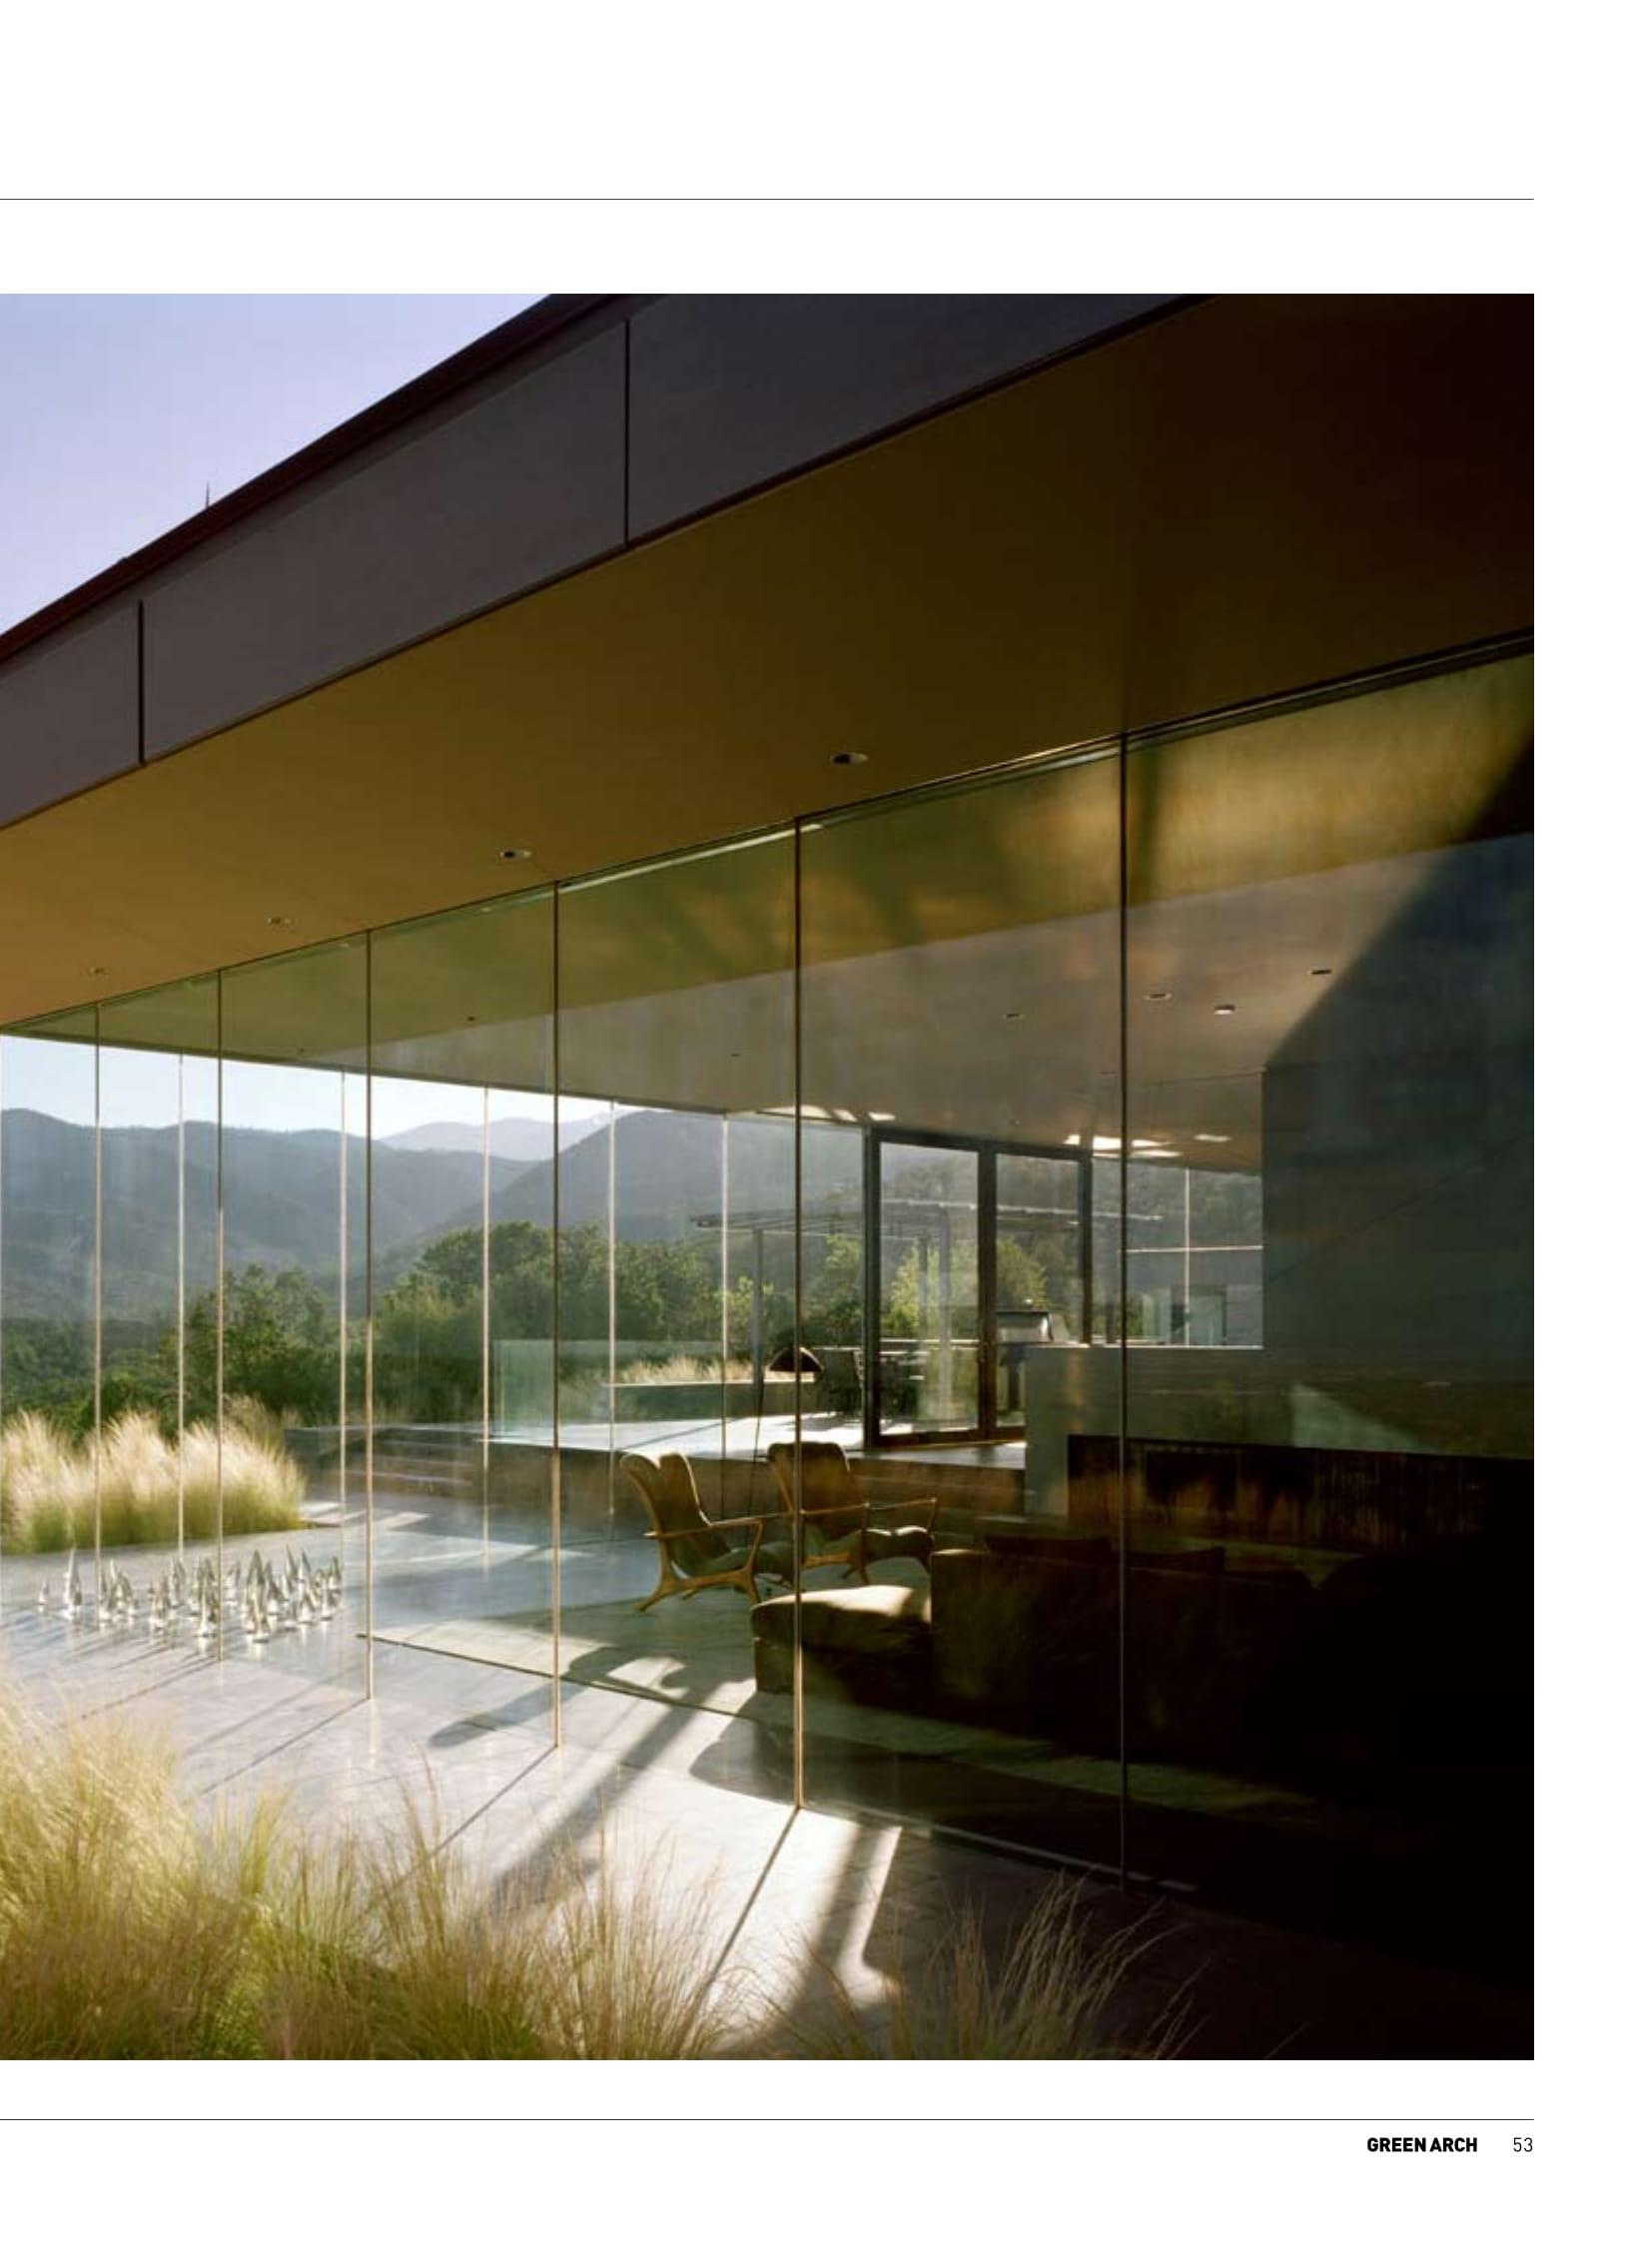 DuBois+Santa+Fe+IGA+Glass+Bearing+Wall-02.jpg